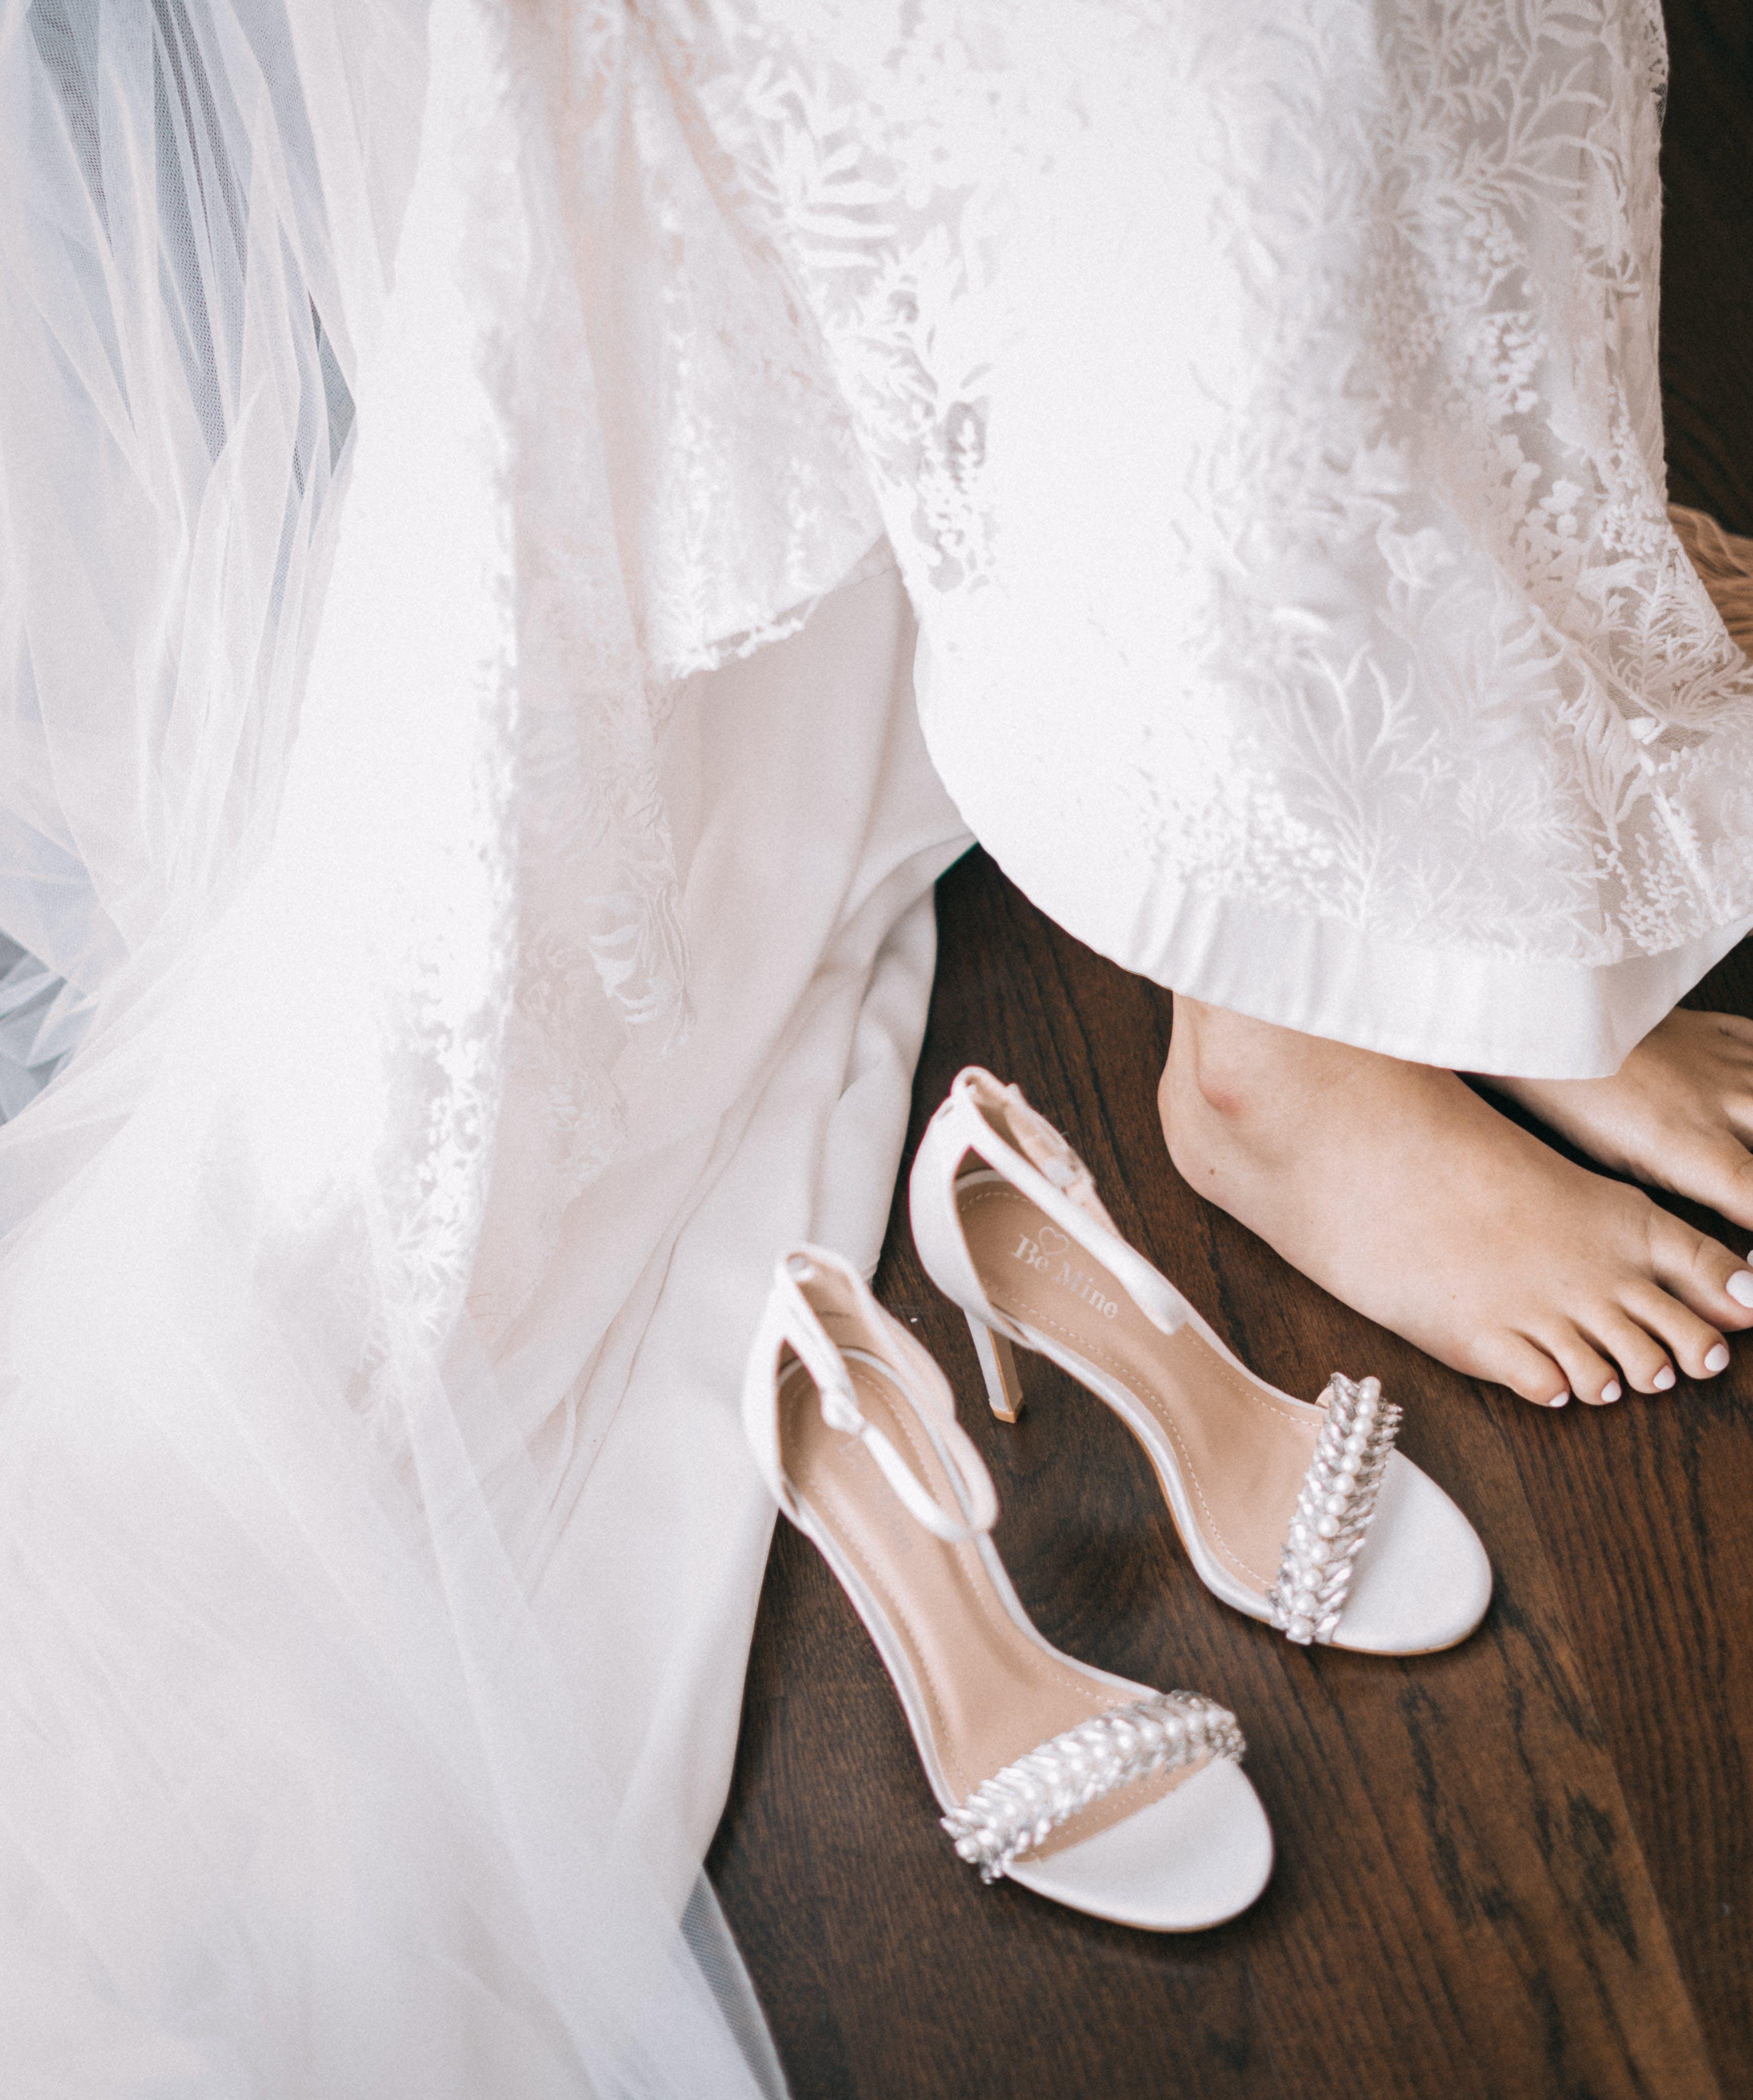 Fotos de stock gratuitas de blanco, Boda, de moda, desgaste